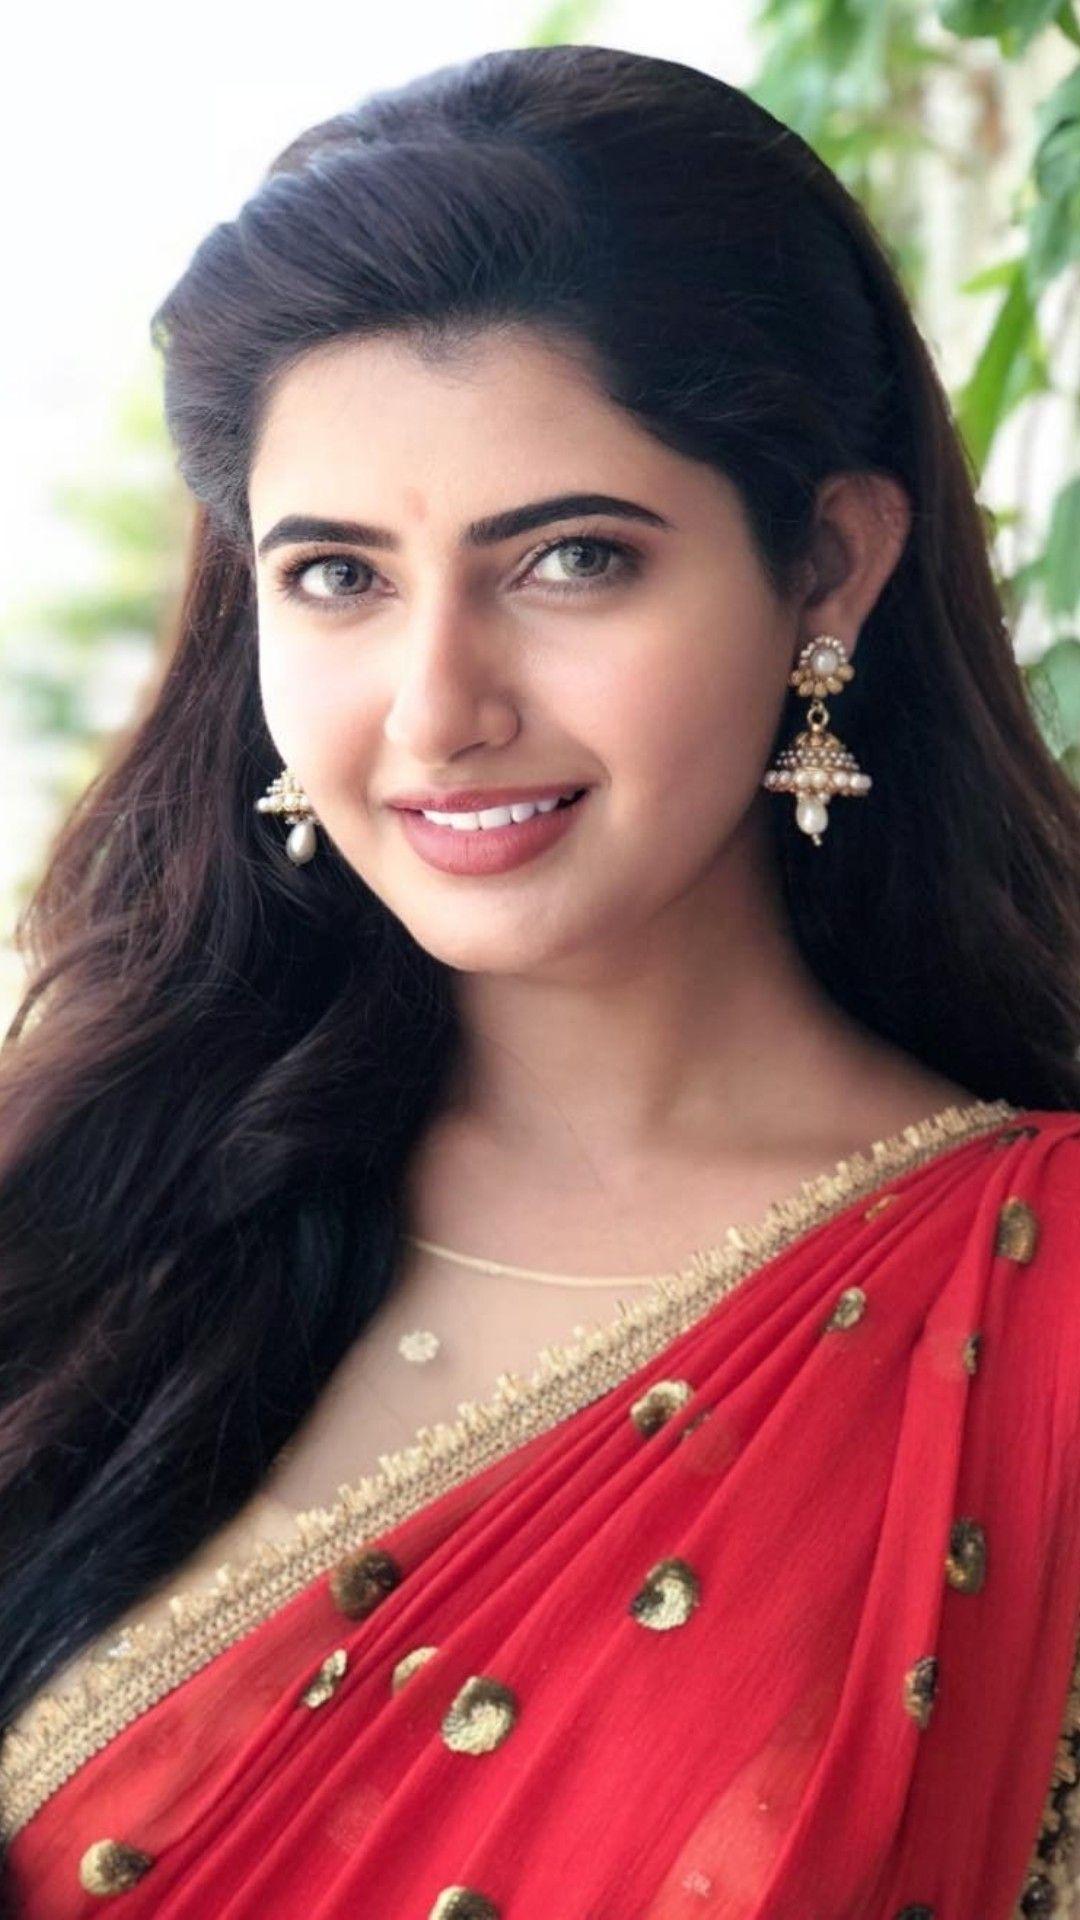 Satrughana  Womens Fashion  Beauty Women, Most -3193